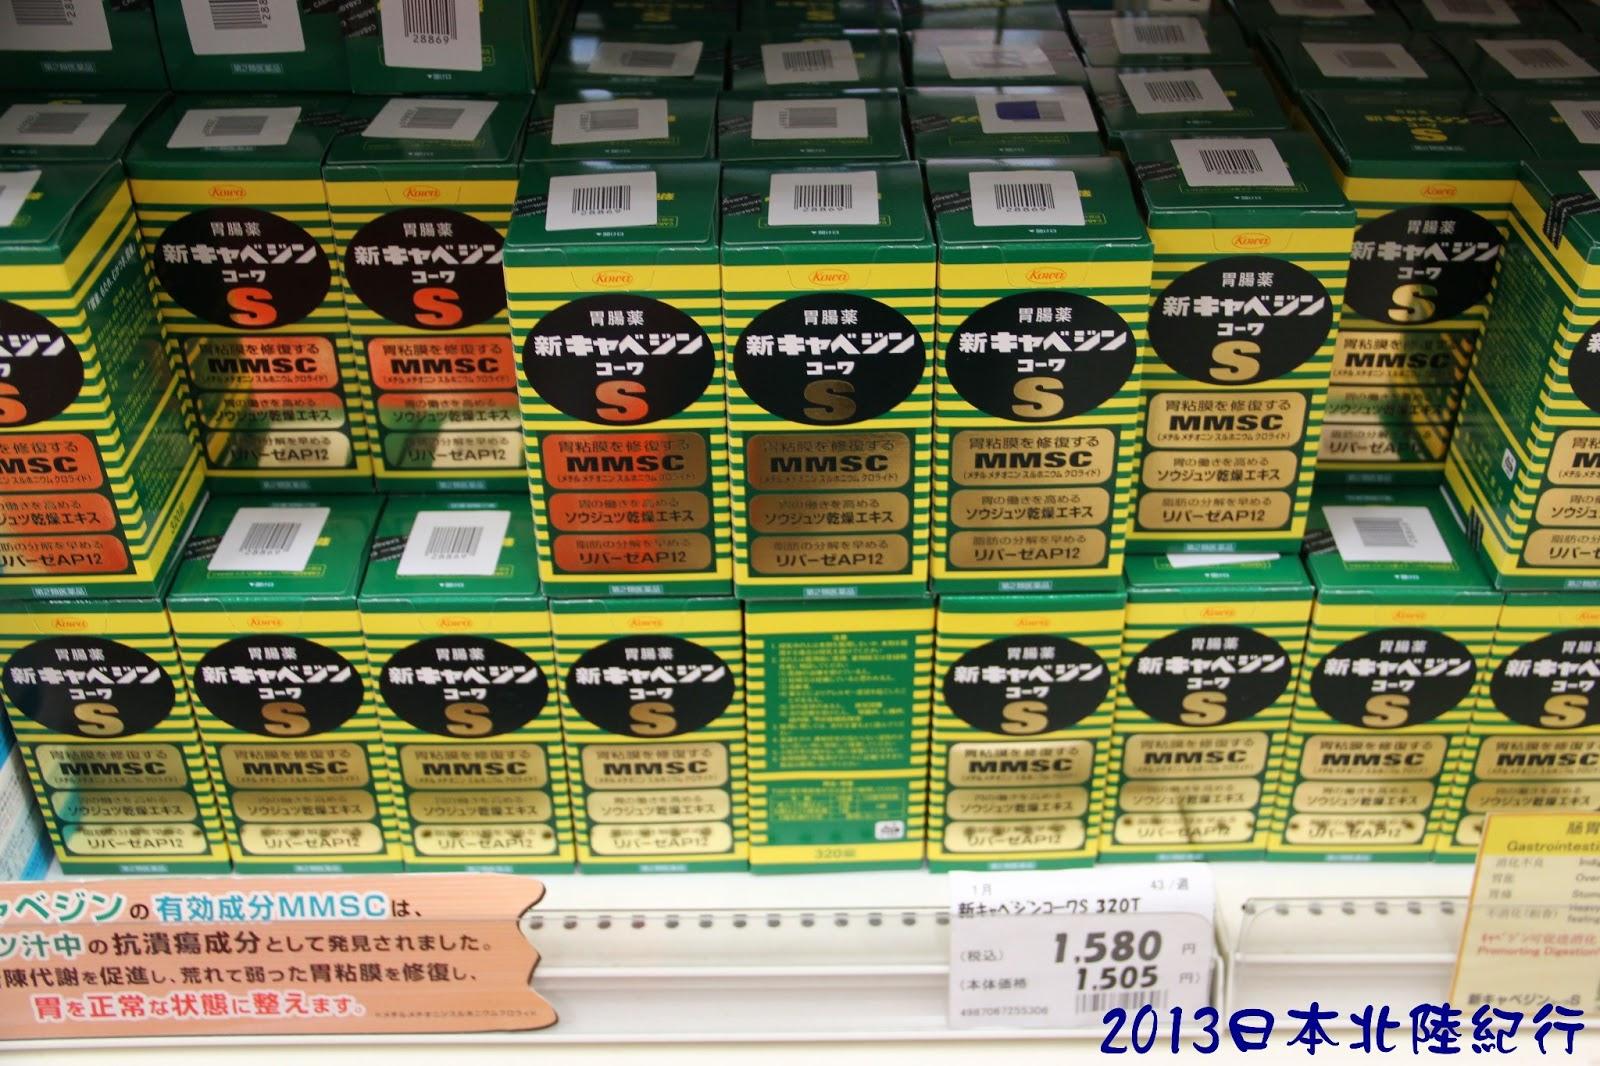 日本腸胃藥 mmsc|mmsc- 日本腸胃藥 mmsc|mmsc - 快熱資訊 - 走進時代